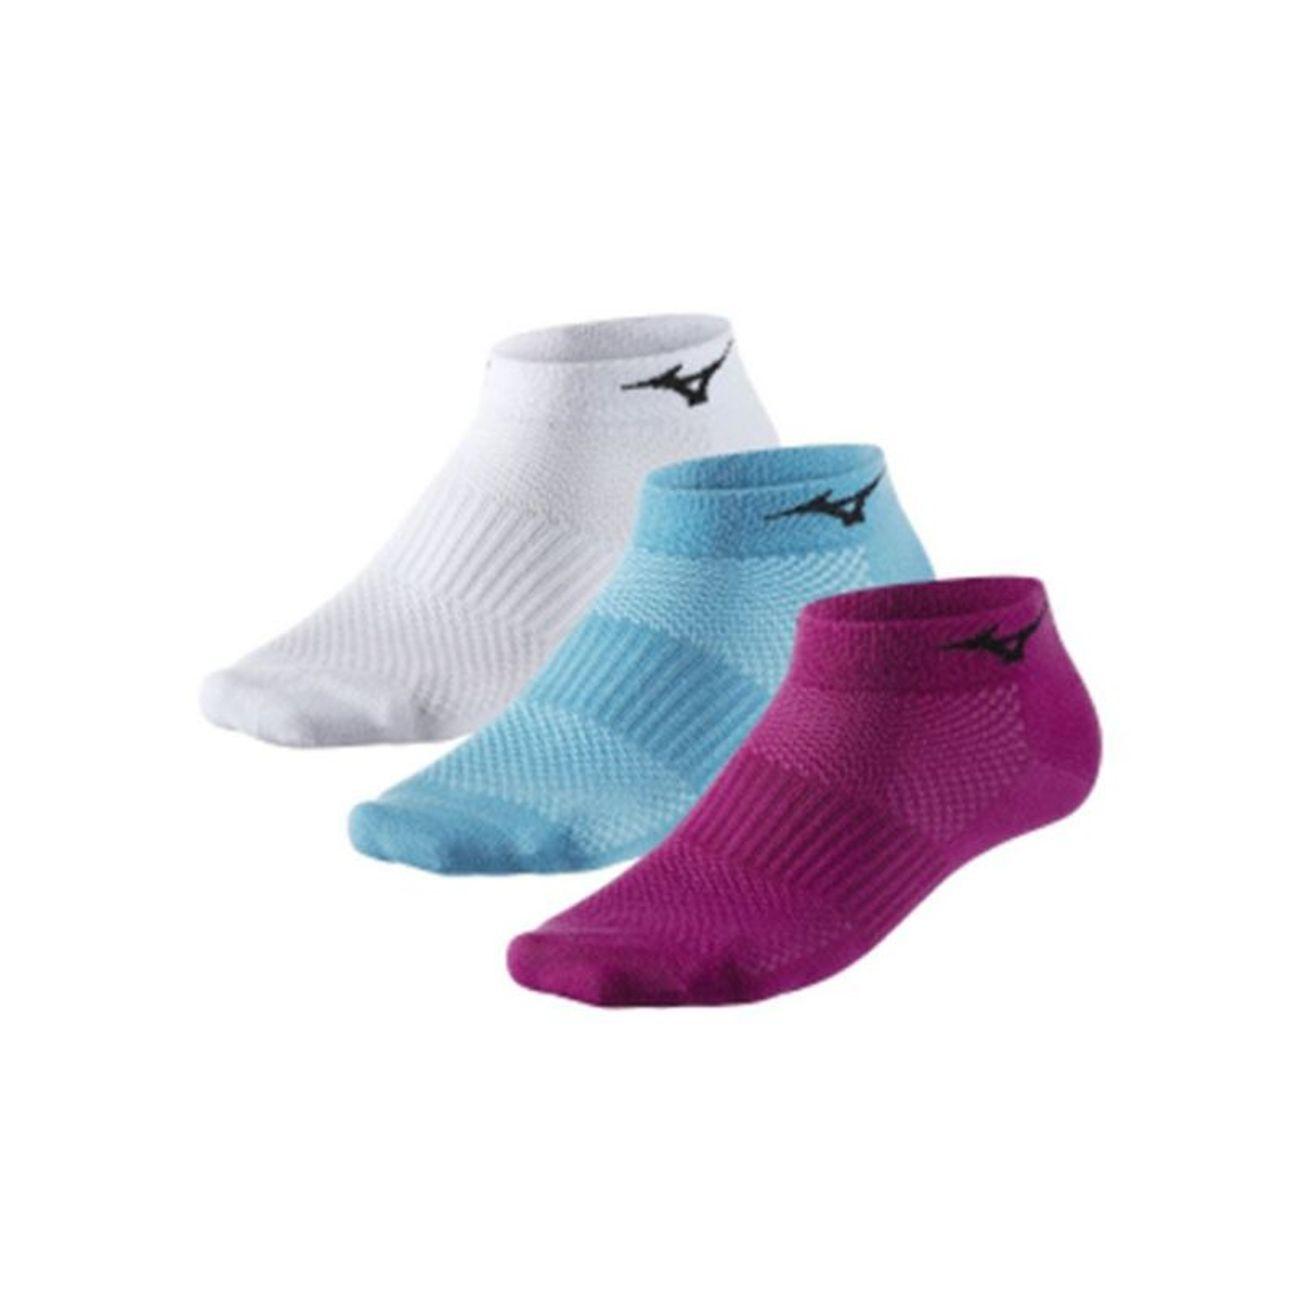 Lila Padel Run Blanco Calcetines 6 Sock Pack Mizuno Homme Celeste 67xuu95069 wXZPkiuTO